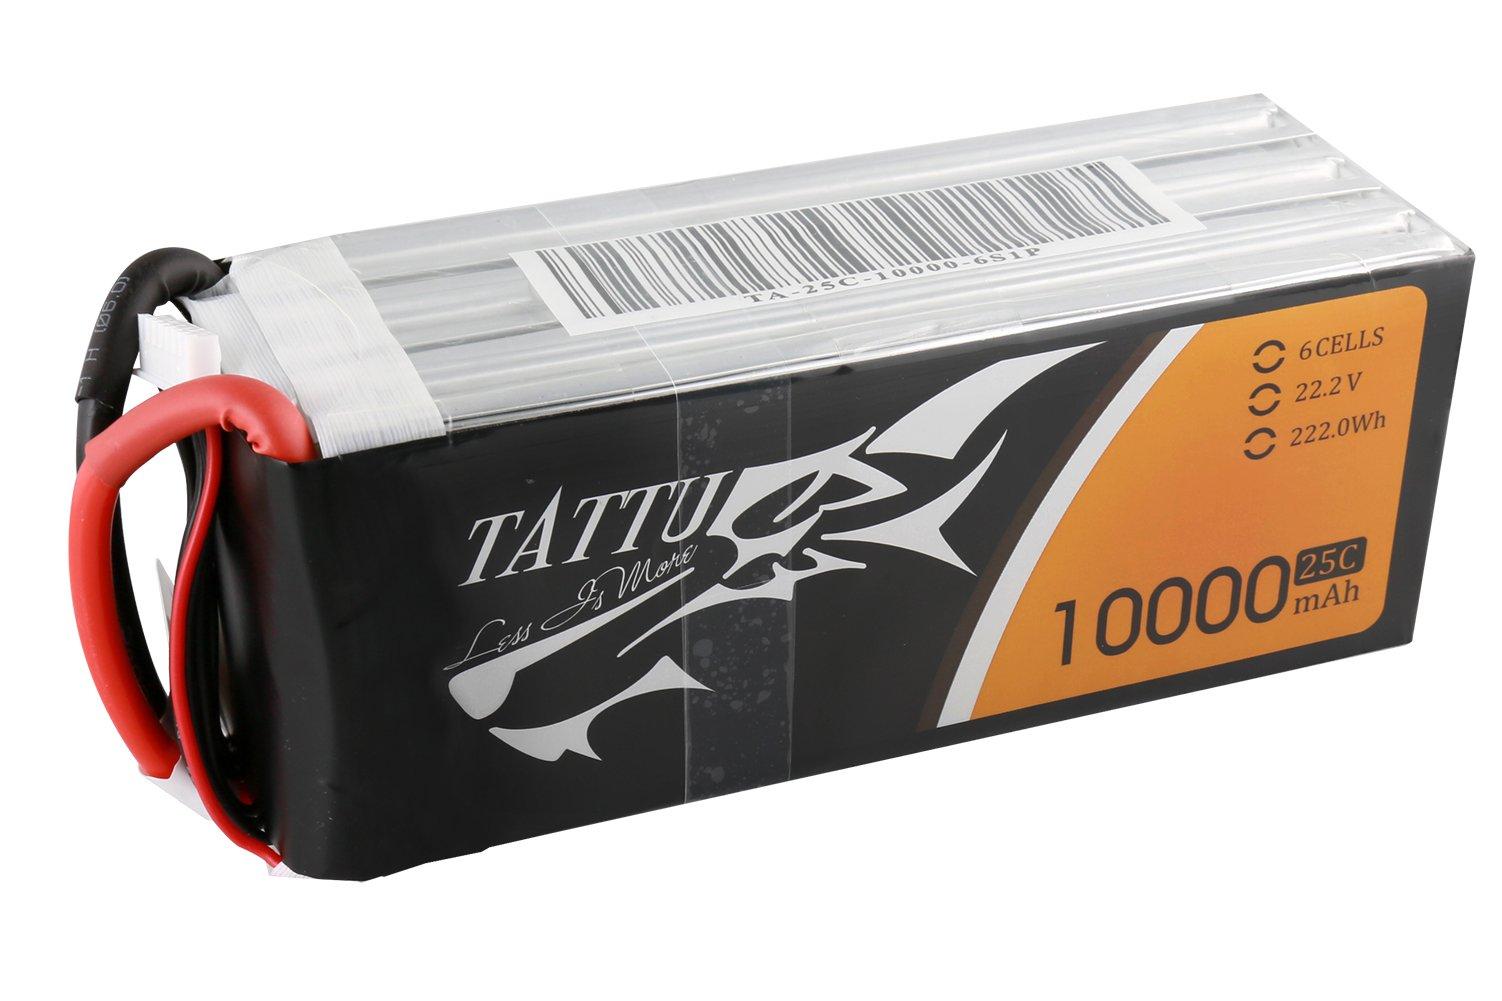 Bateria para DJI S800 10000mAh 22.2V 25C 6S LiPo